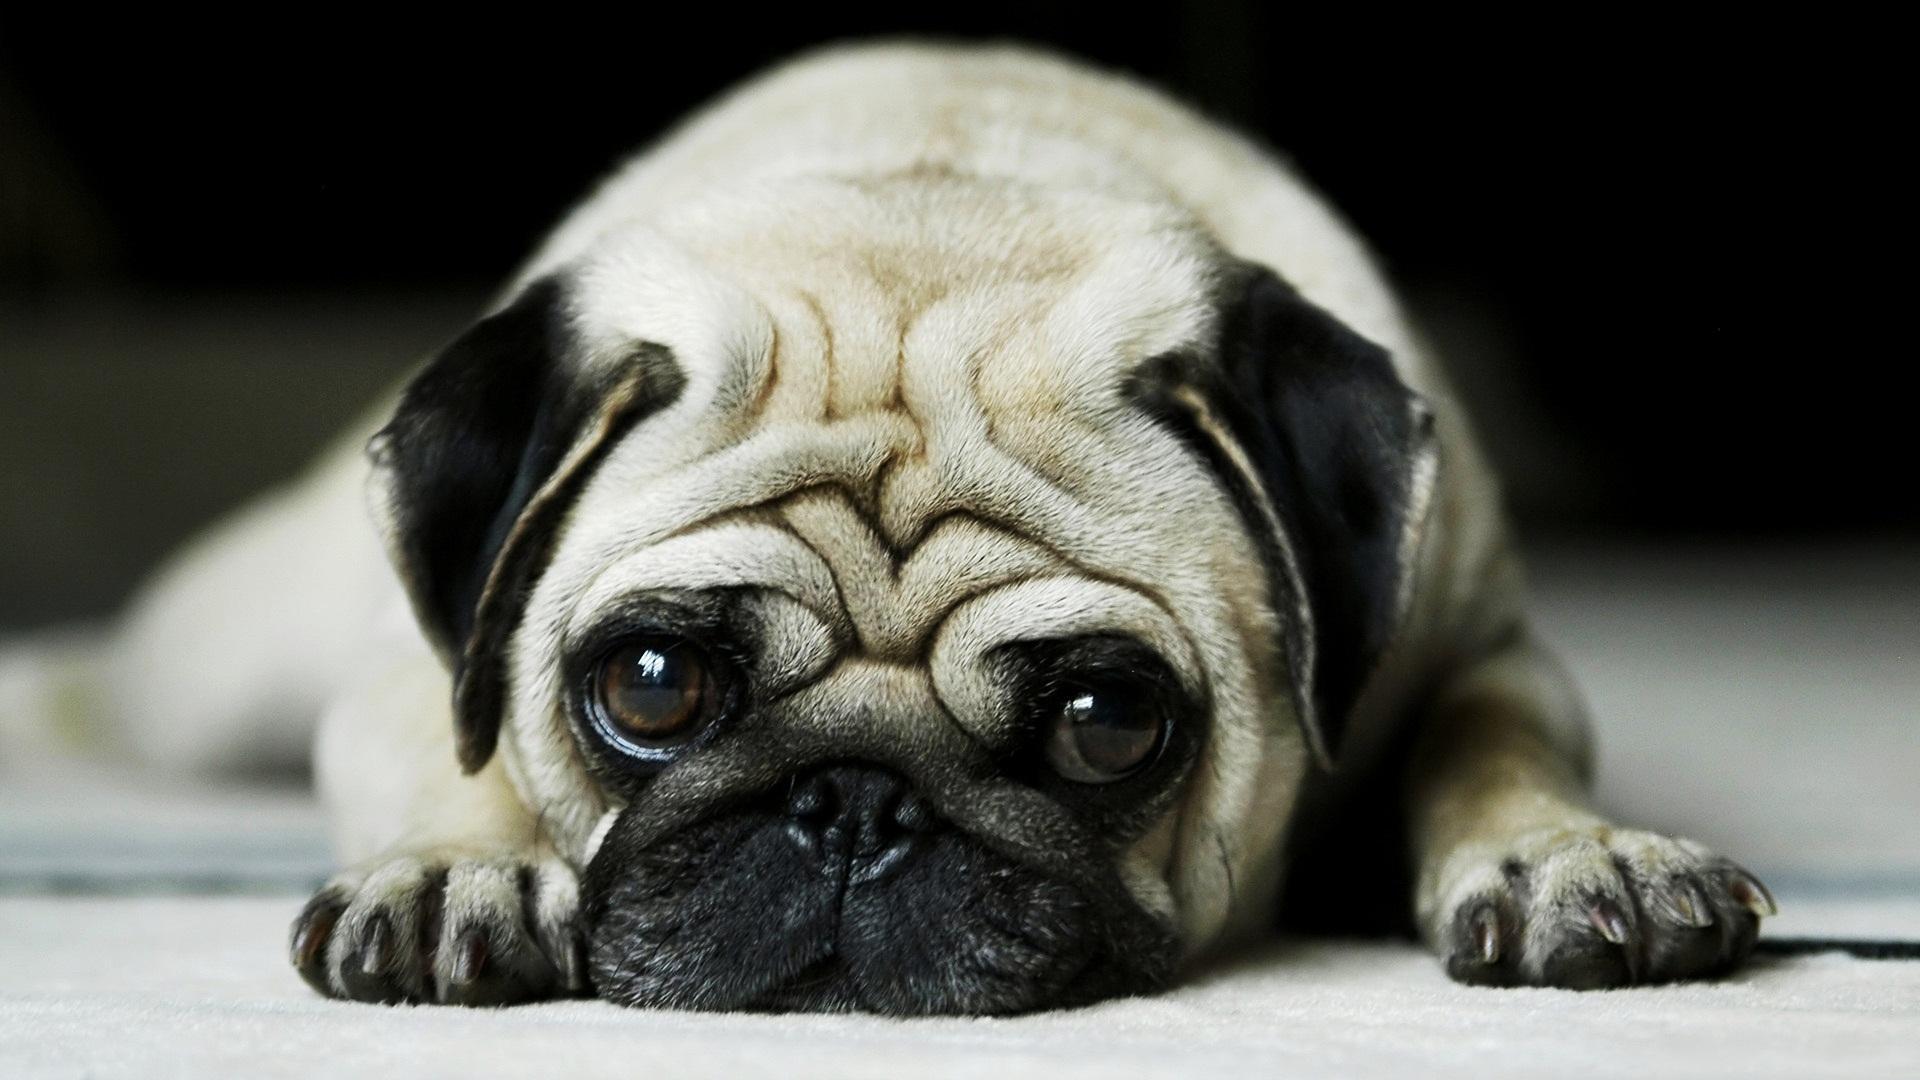 pug-cute-dog-pet-animal-1920x1080